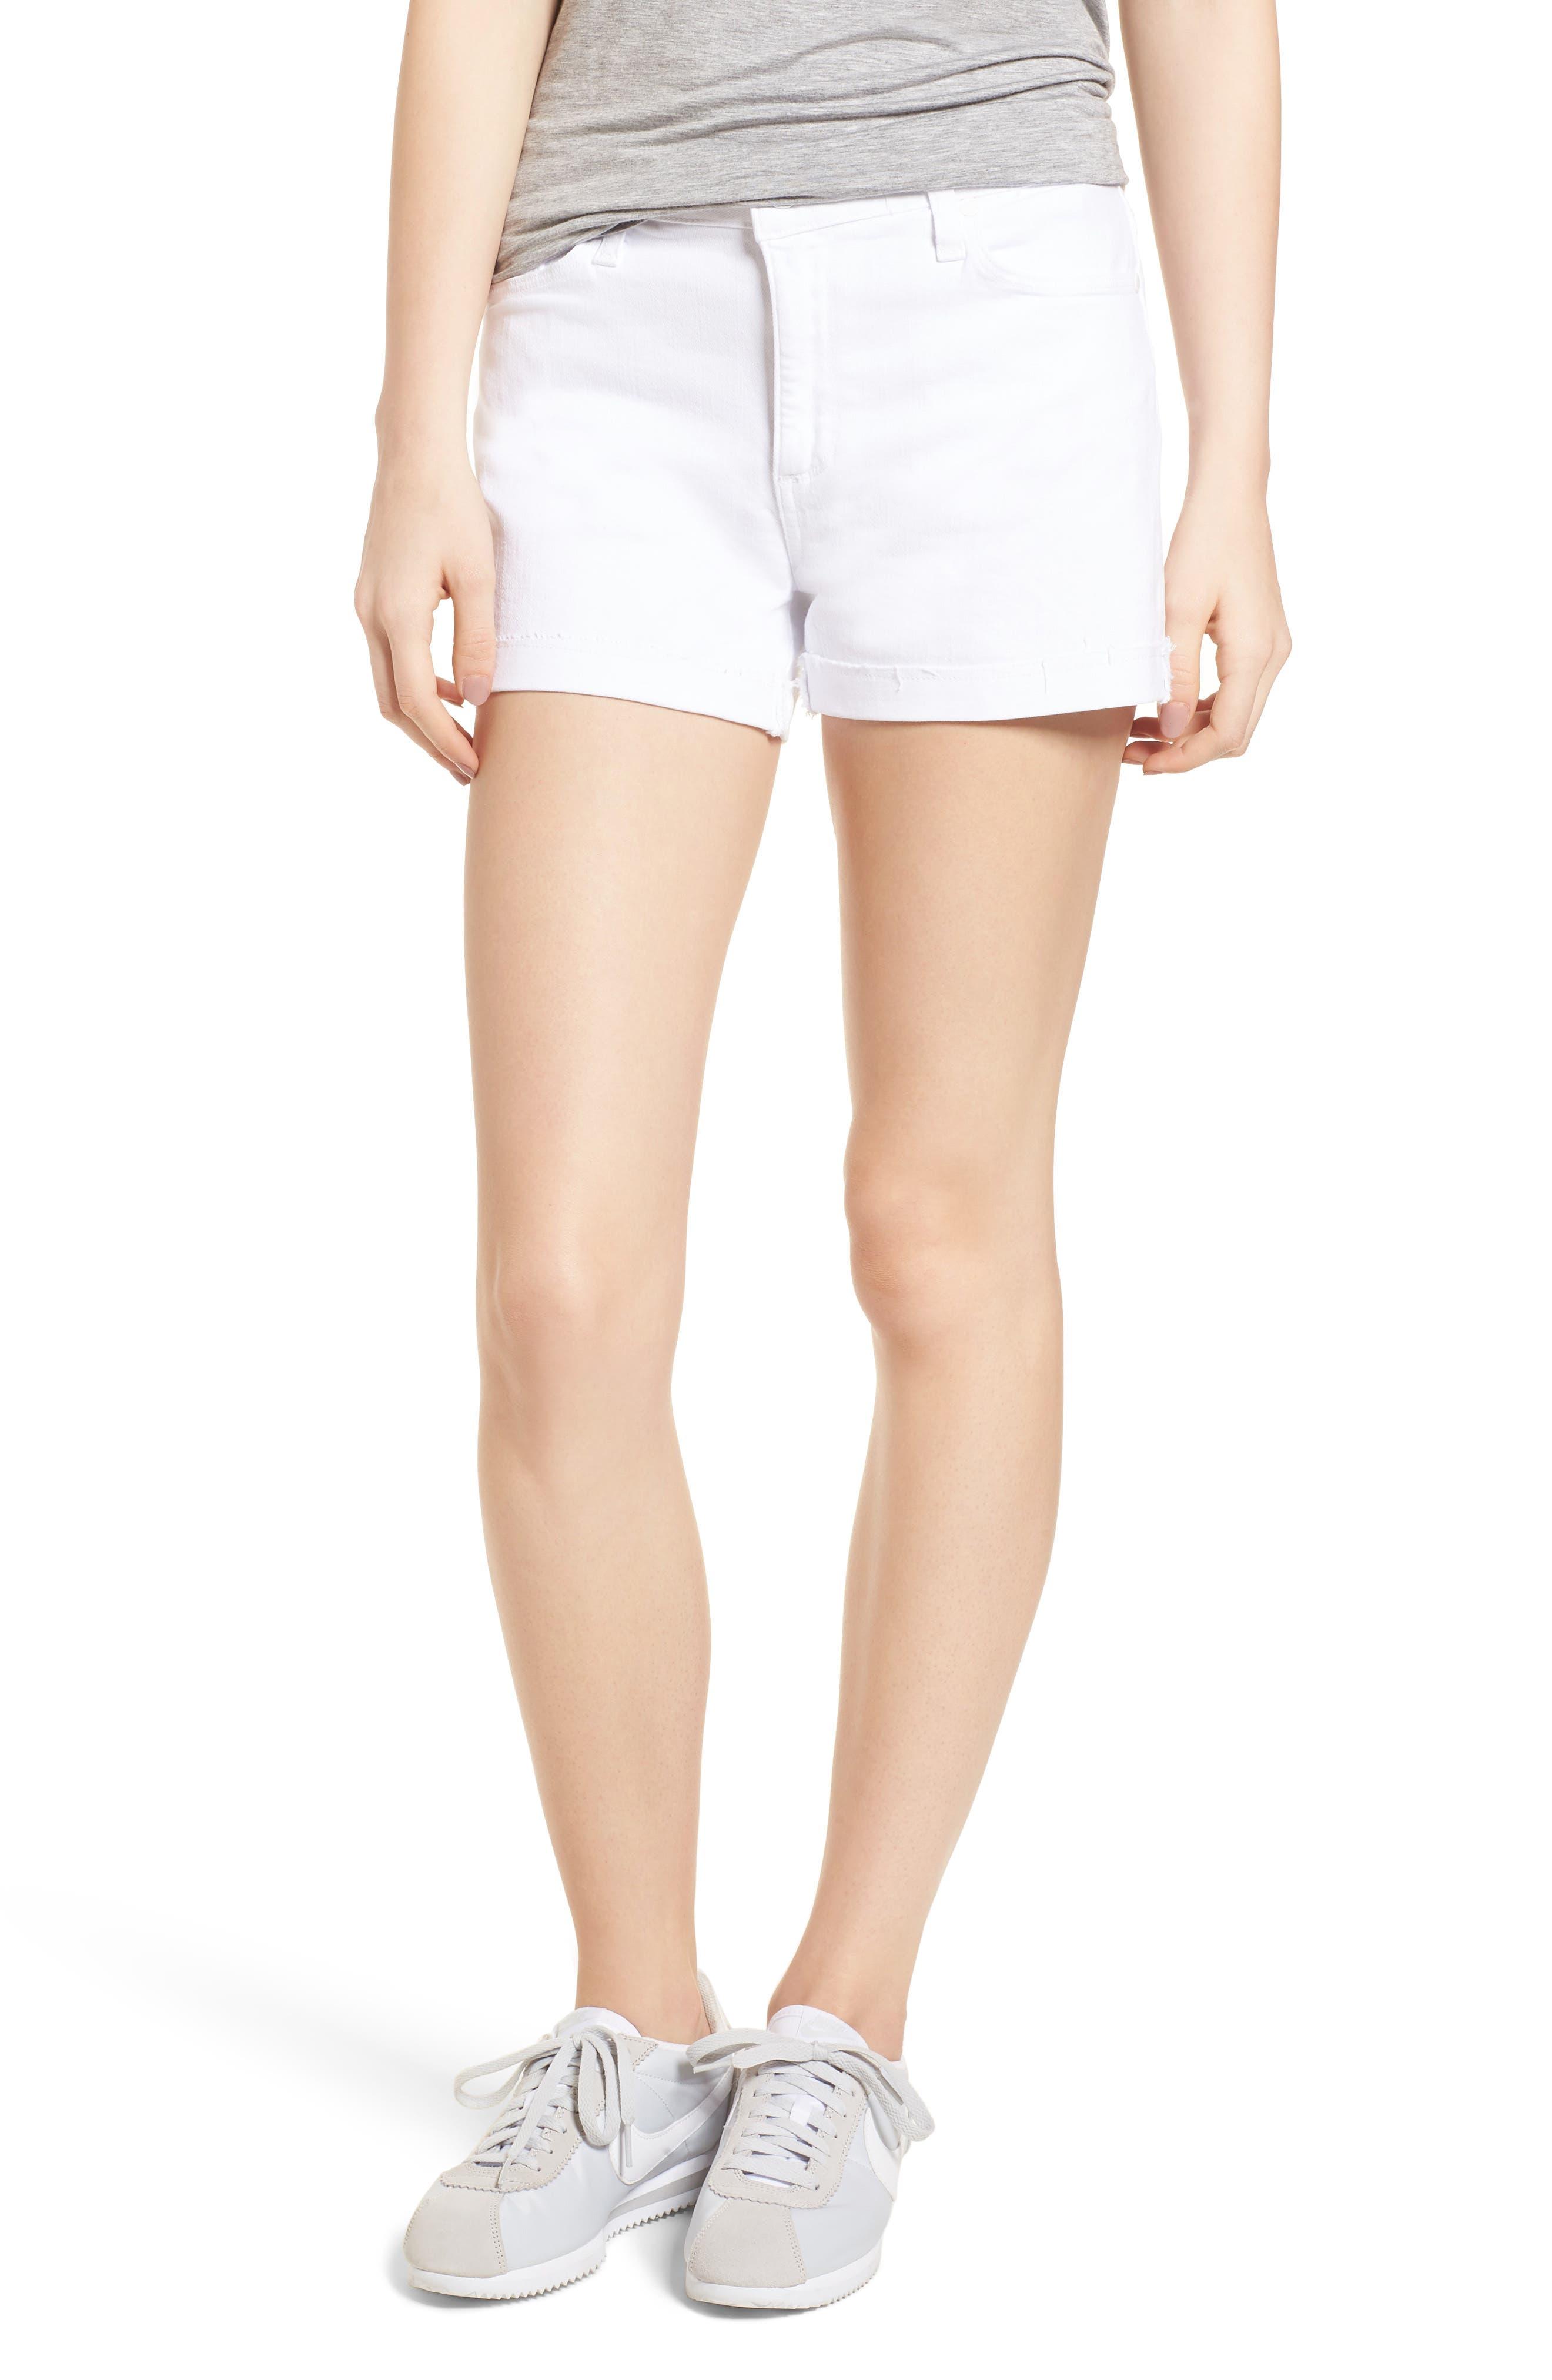 Jimmy Jimmy High Waist Denim Shorts,                             Main thumbnail 1, color,                             Crisp White